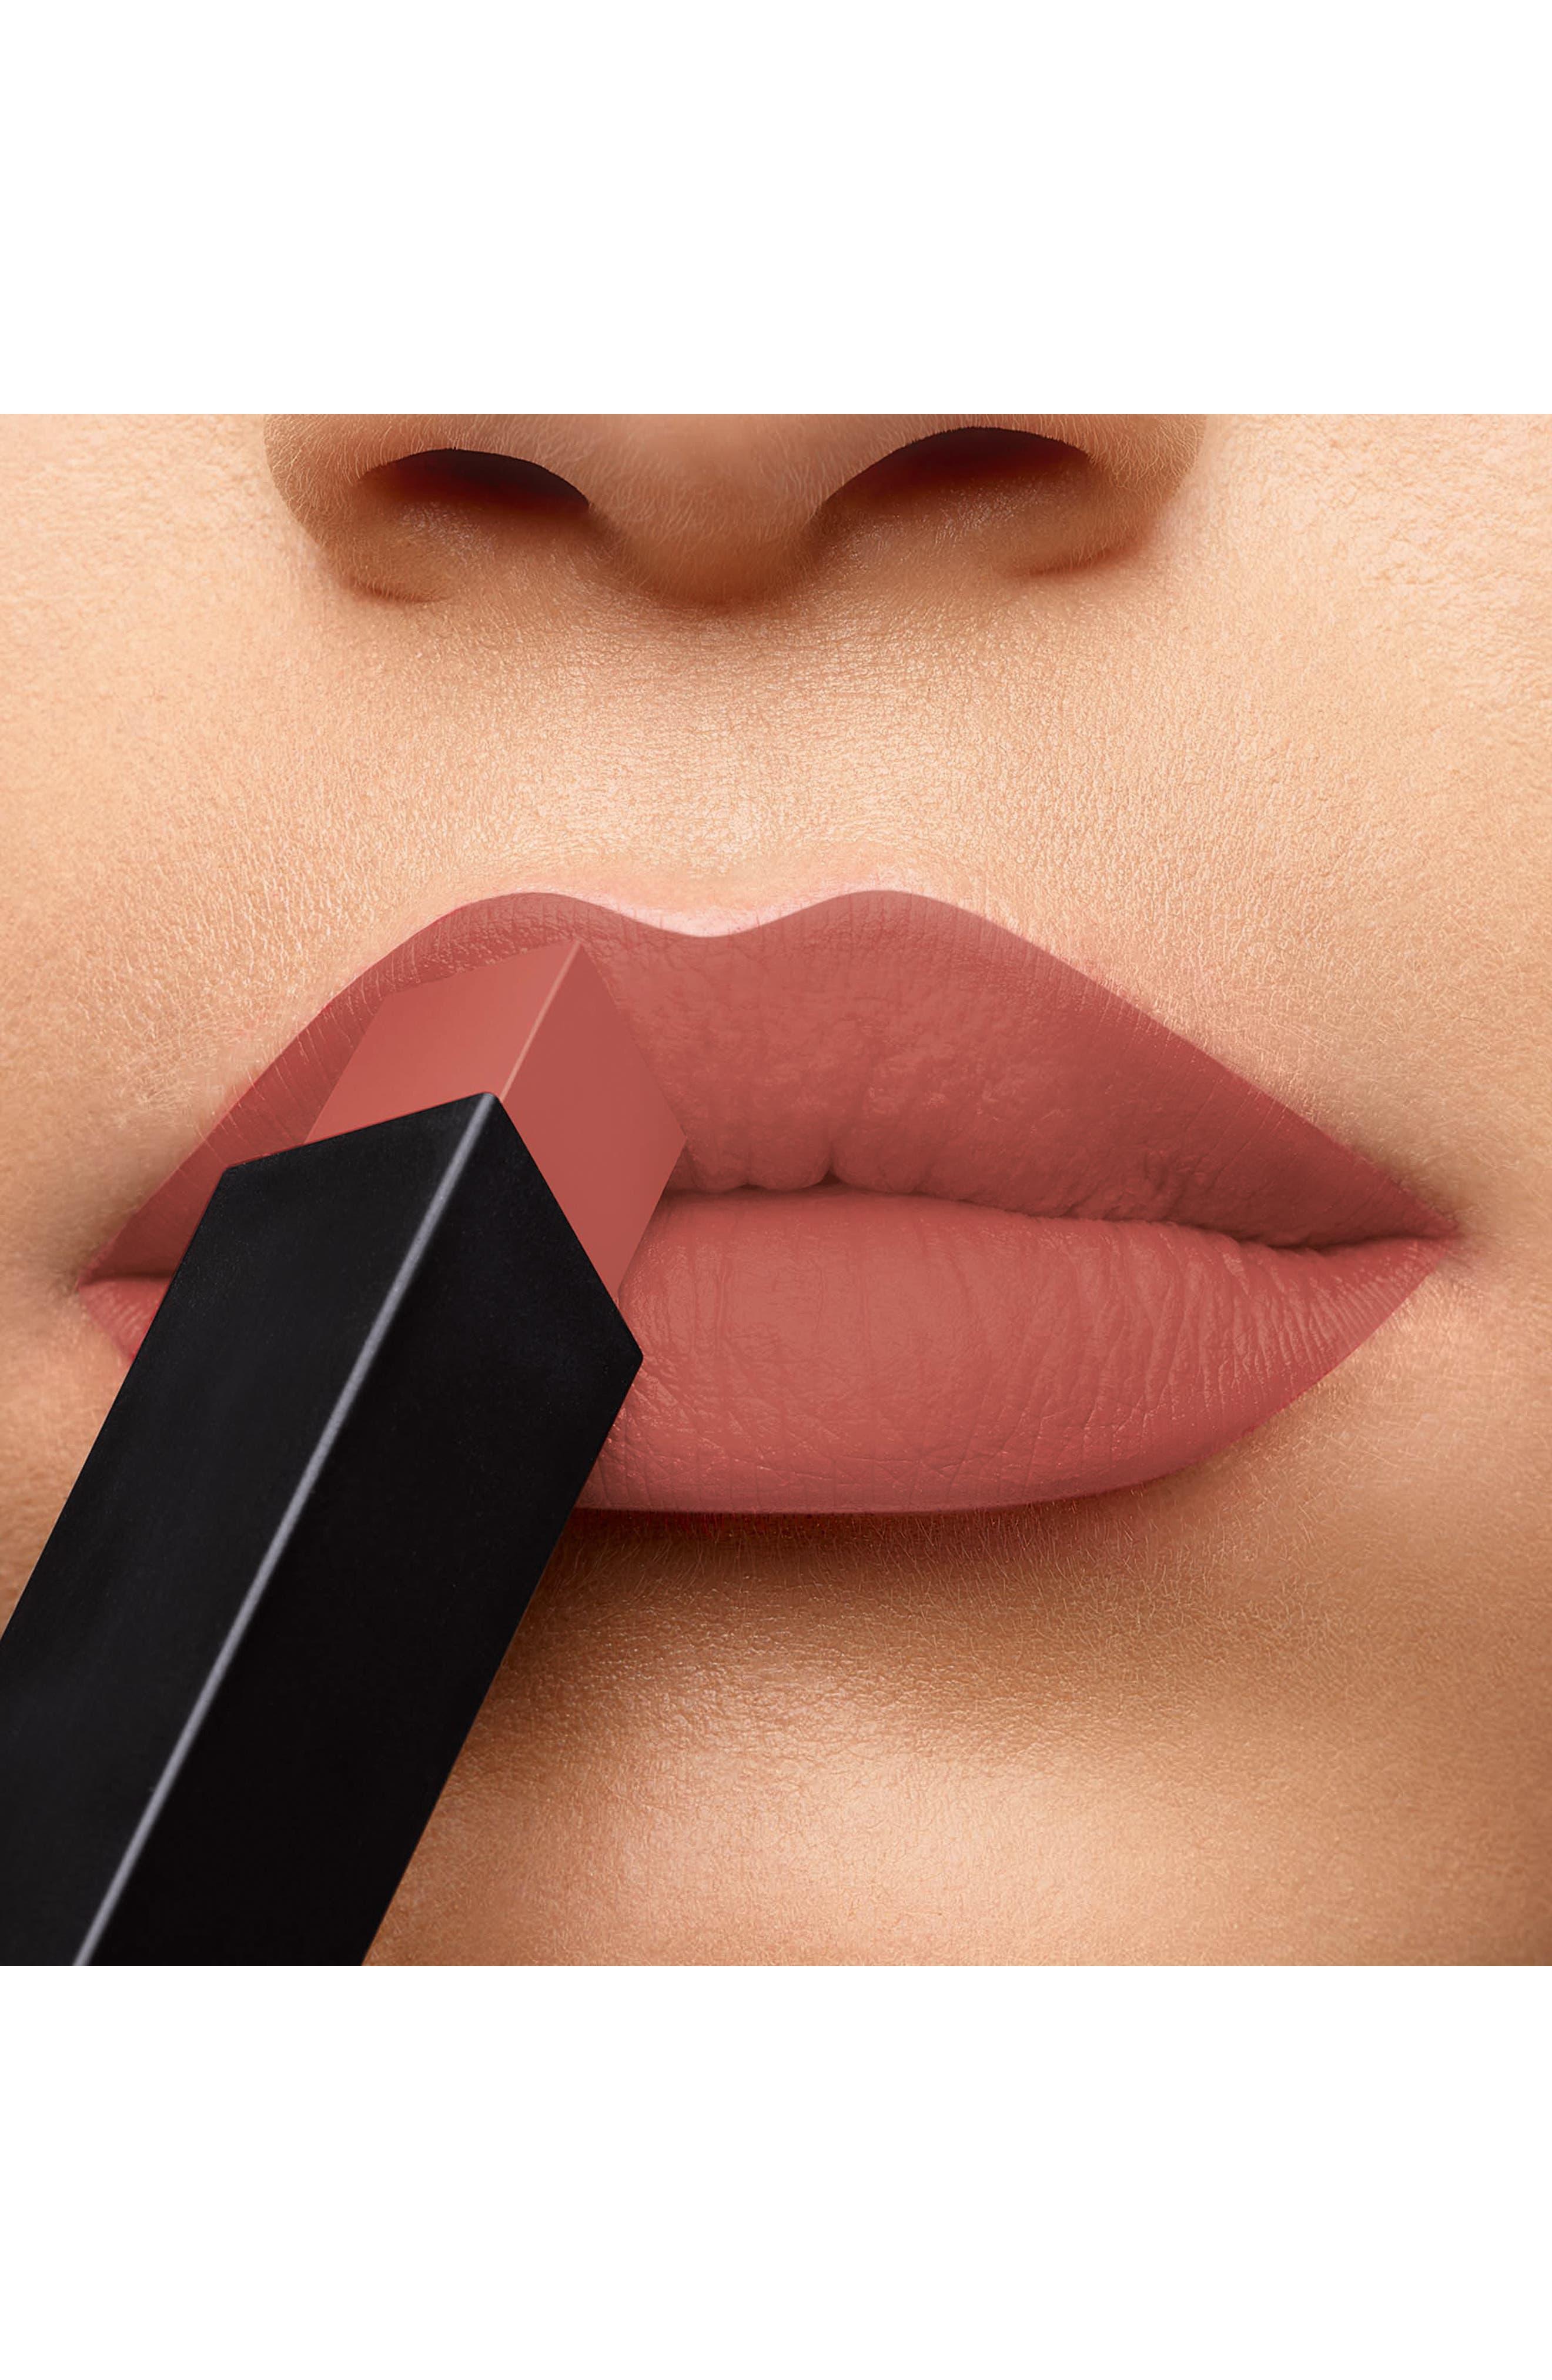 Rouge Pur Couture The Slim Matte Lipstick,                             Alternate thumbnail 2, color,                             11 AMBIGUOUS BEIGE